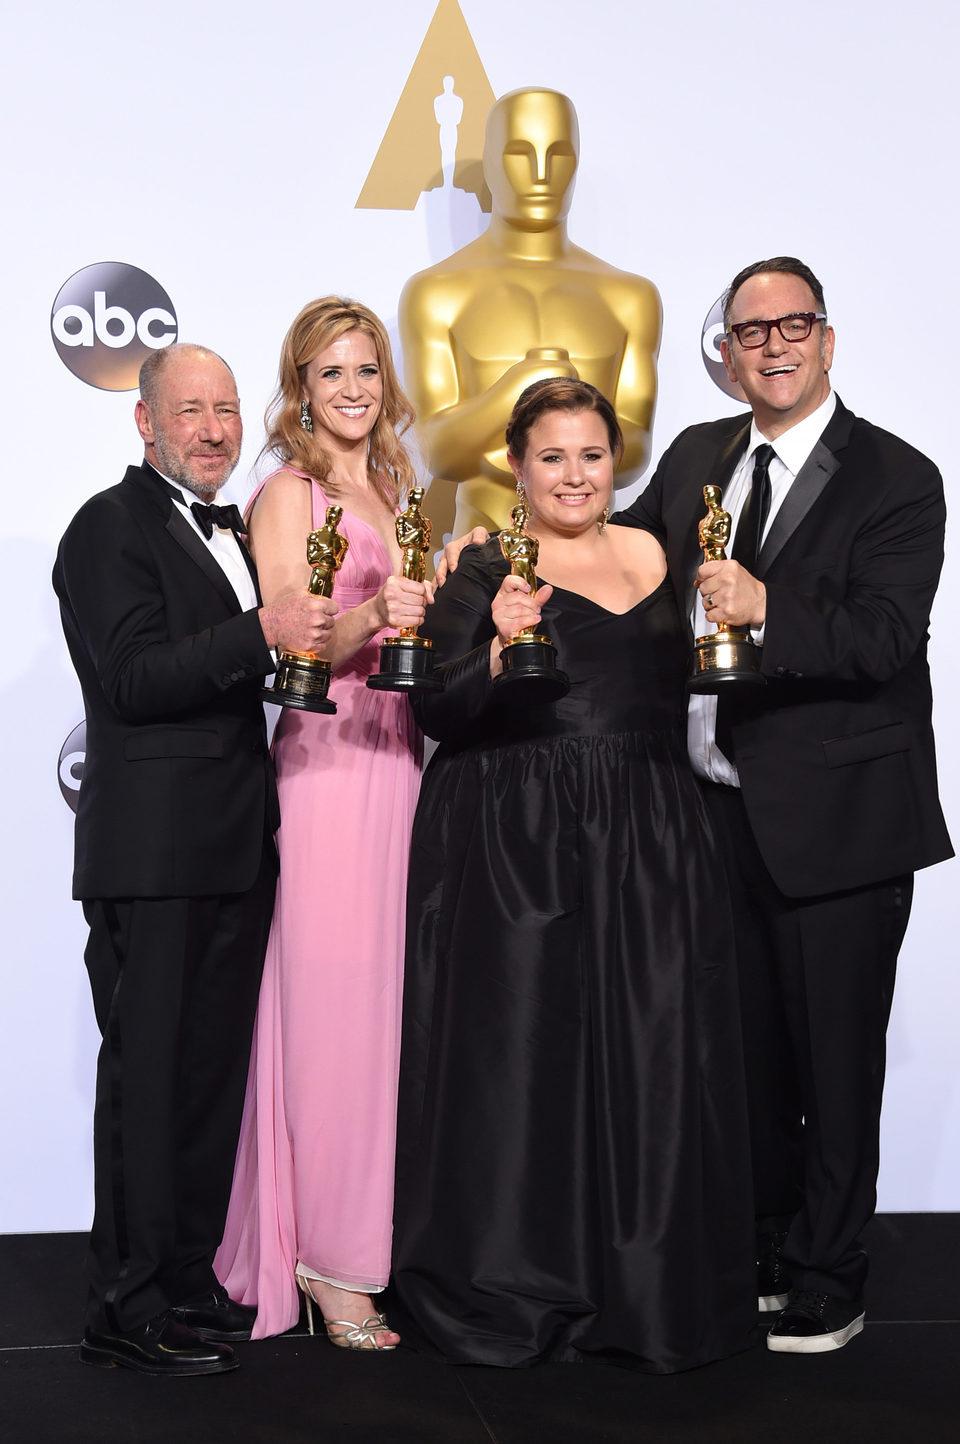 Steve Golin, Nicole Rocklin, Blye Pagon Faust and Michael Sugar Oscars 2016